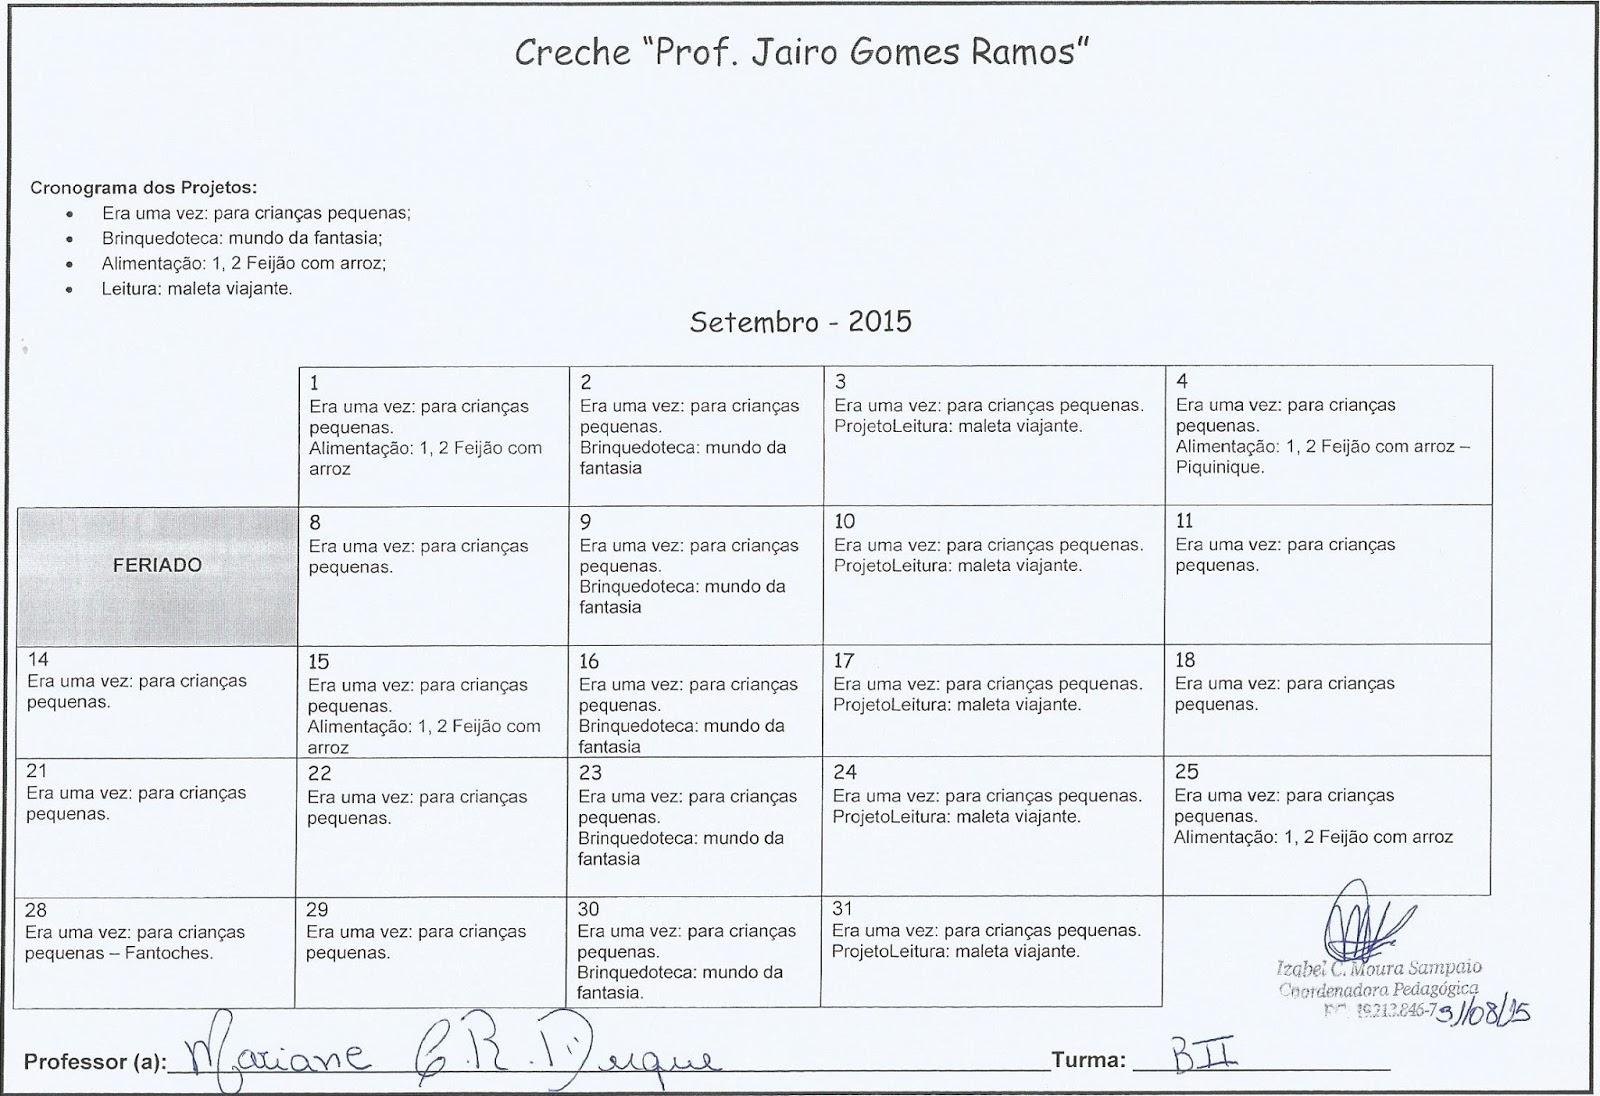 Suficiente Coordenação Pedagógica - Izabel C. M. Sampaio: CRONOGRAMA DOS  JN24